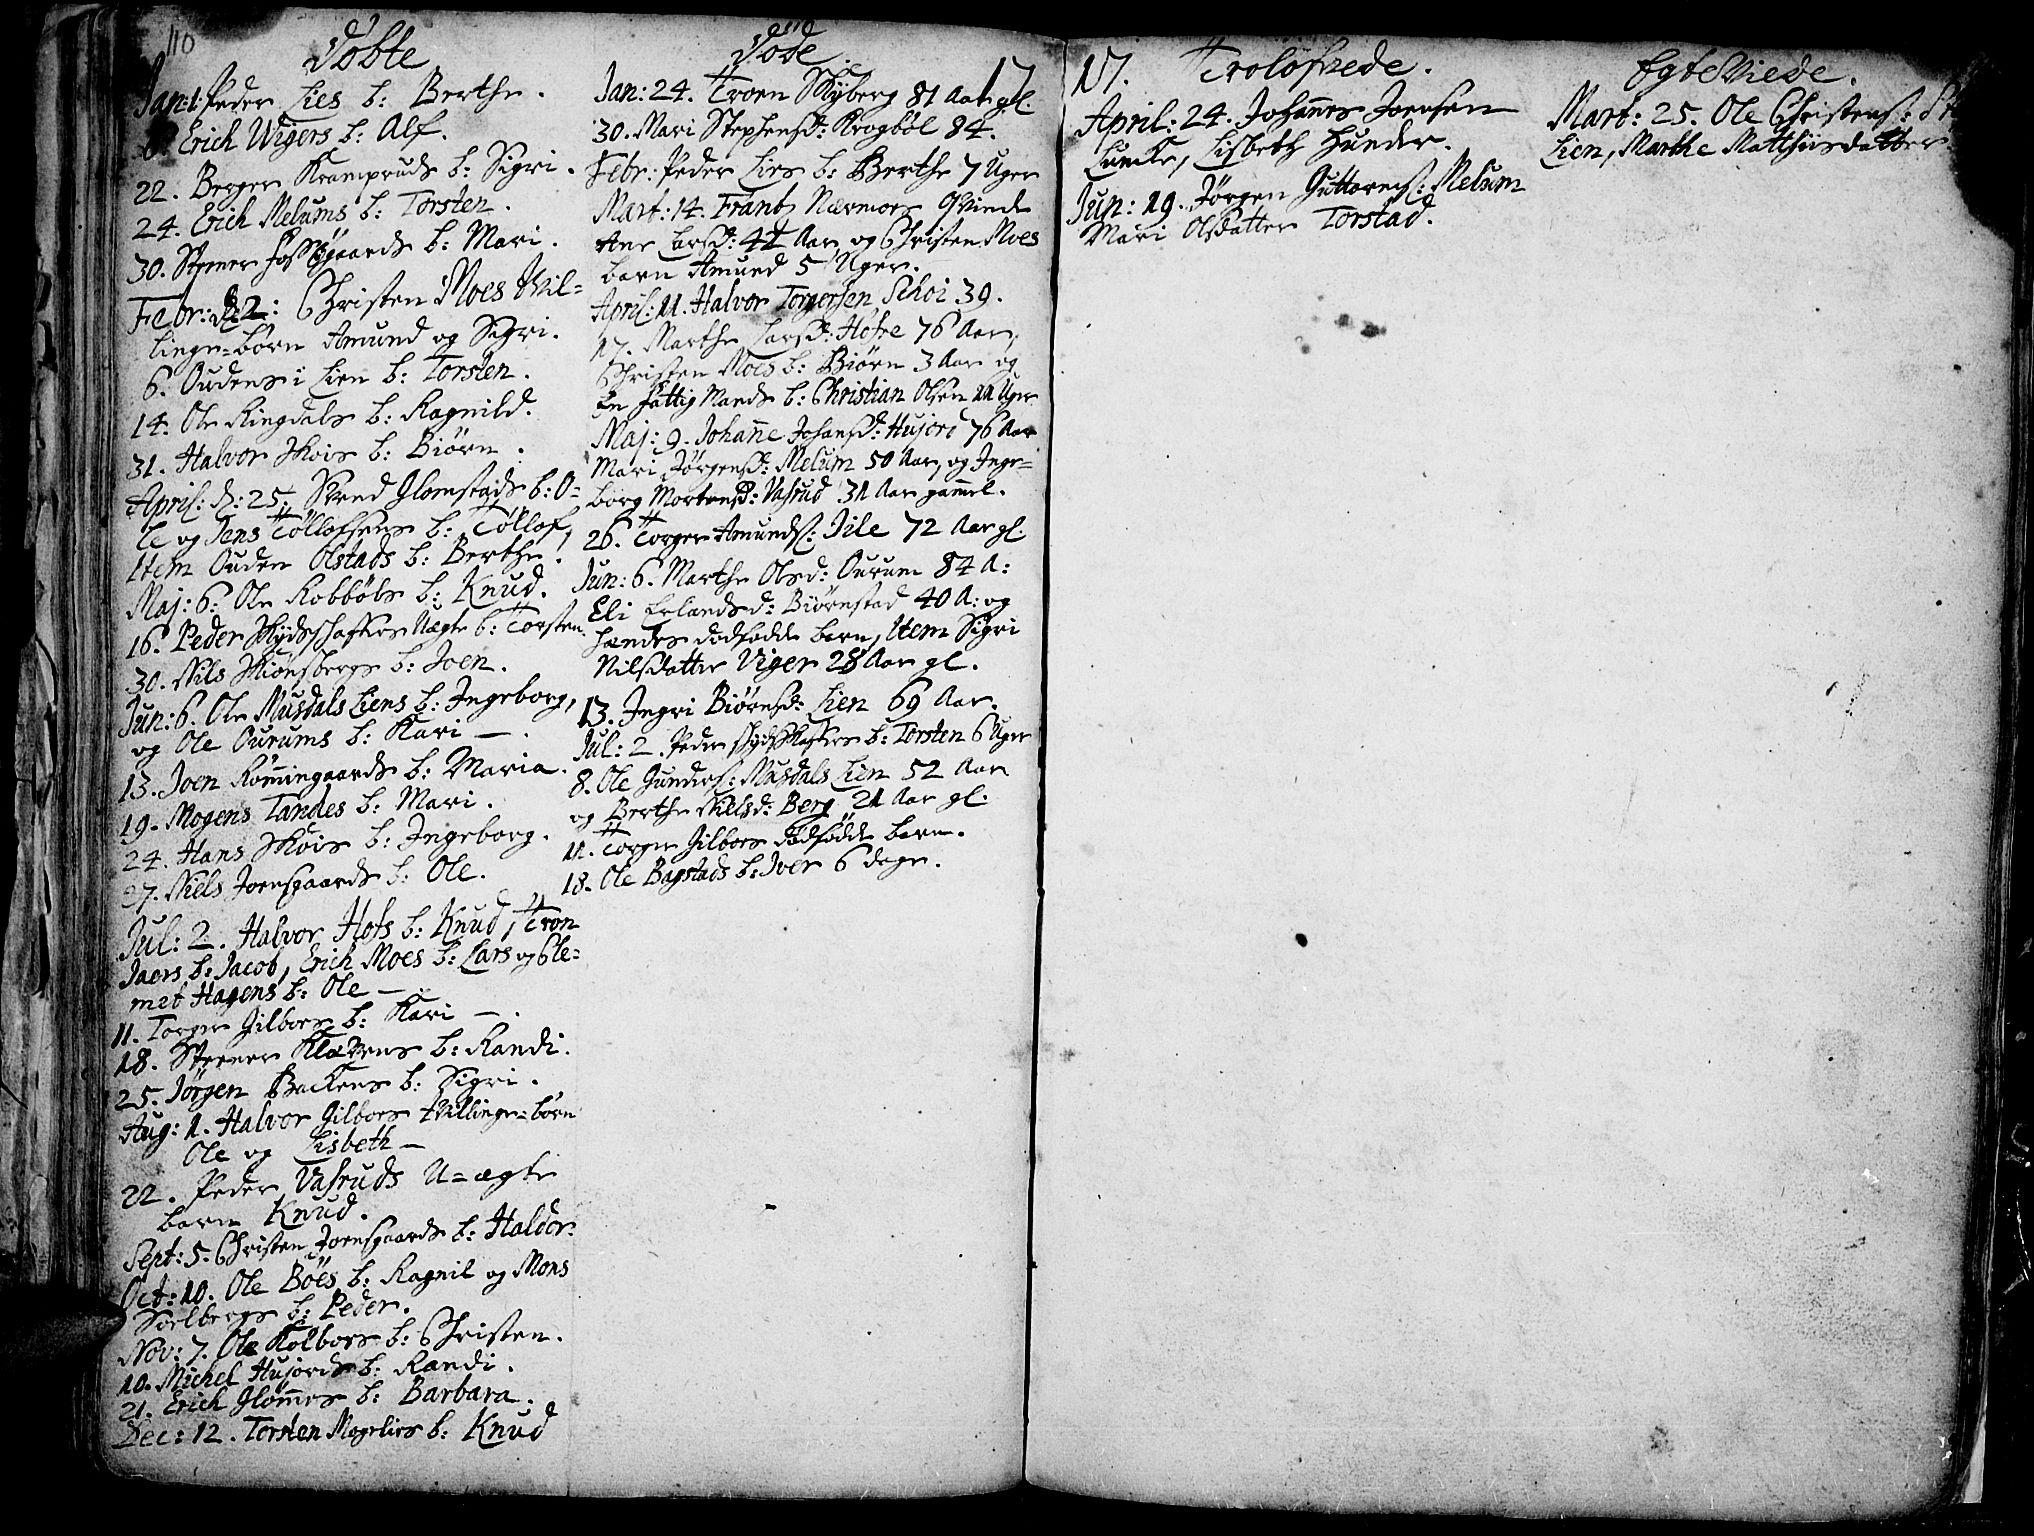 SAH, Øyer prestekontor, Ministerialbok nr. 1, 1671-1727, s. 110-111